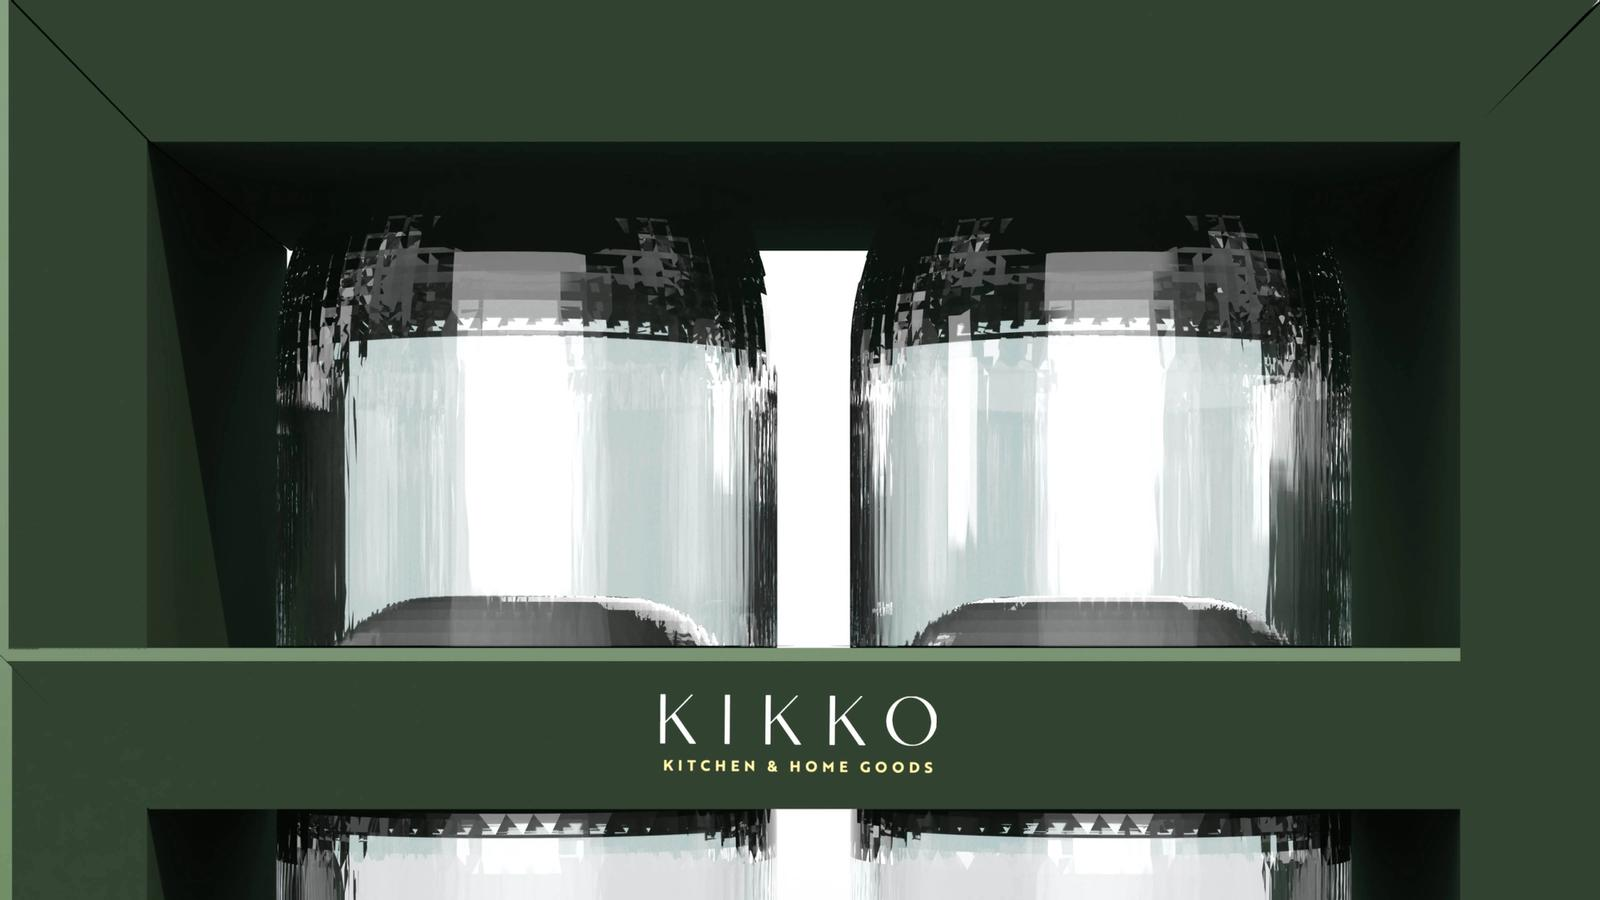 Kikko Glassware // Product Packaging